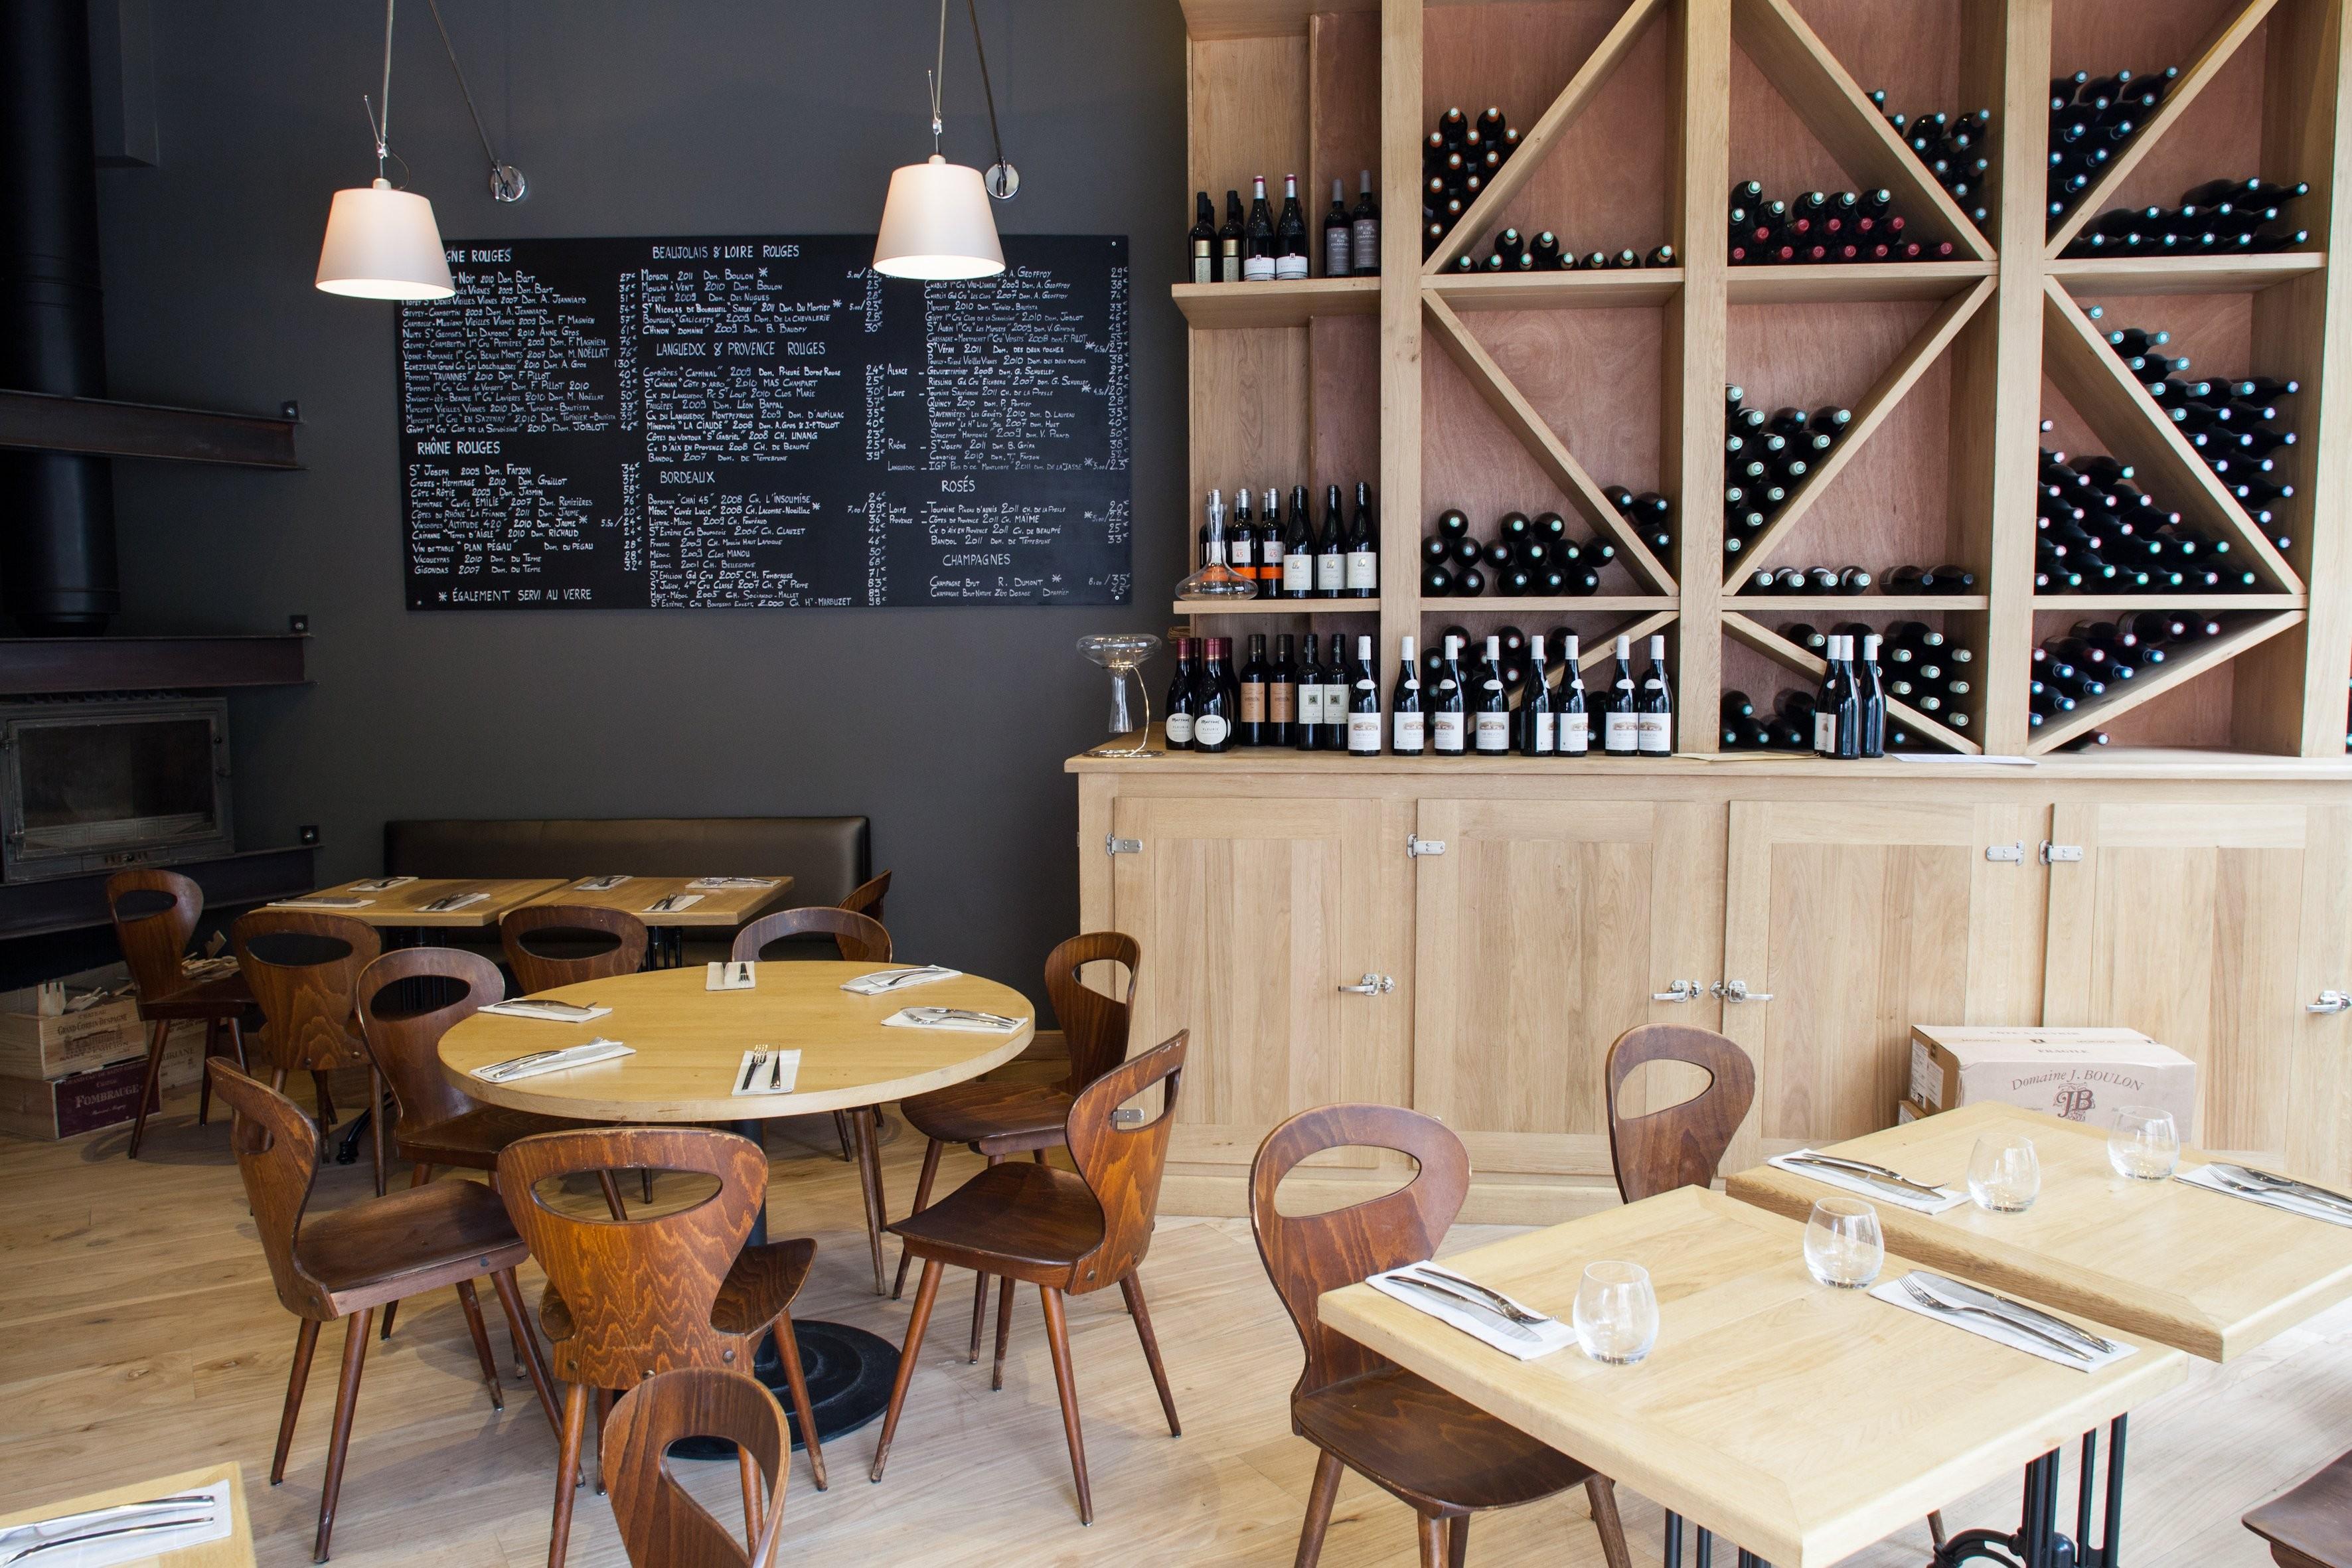 Photos courtesy ofOenolis restaurants. All rights reserved© Oenolis 2016.